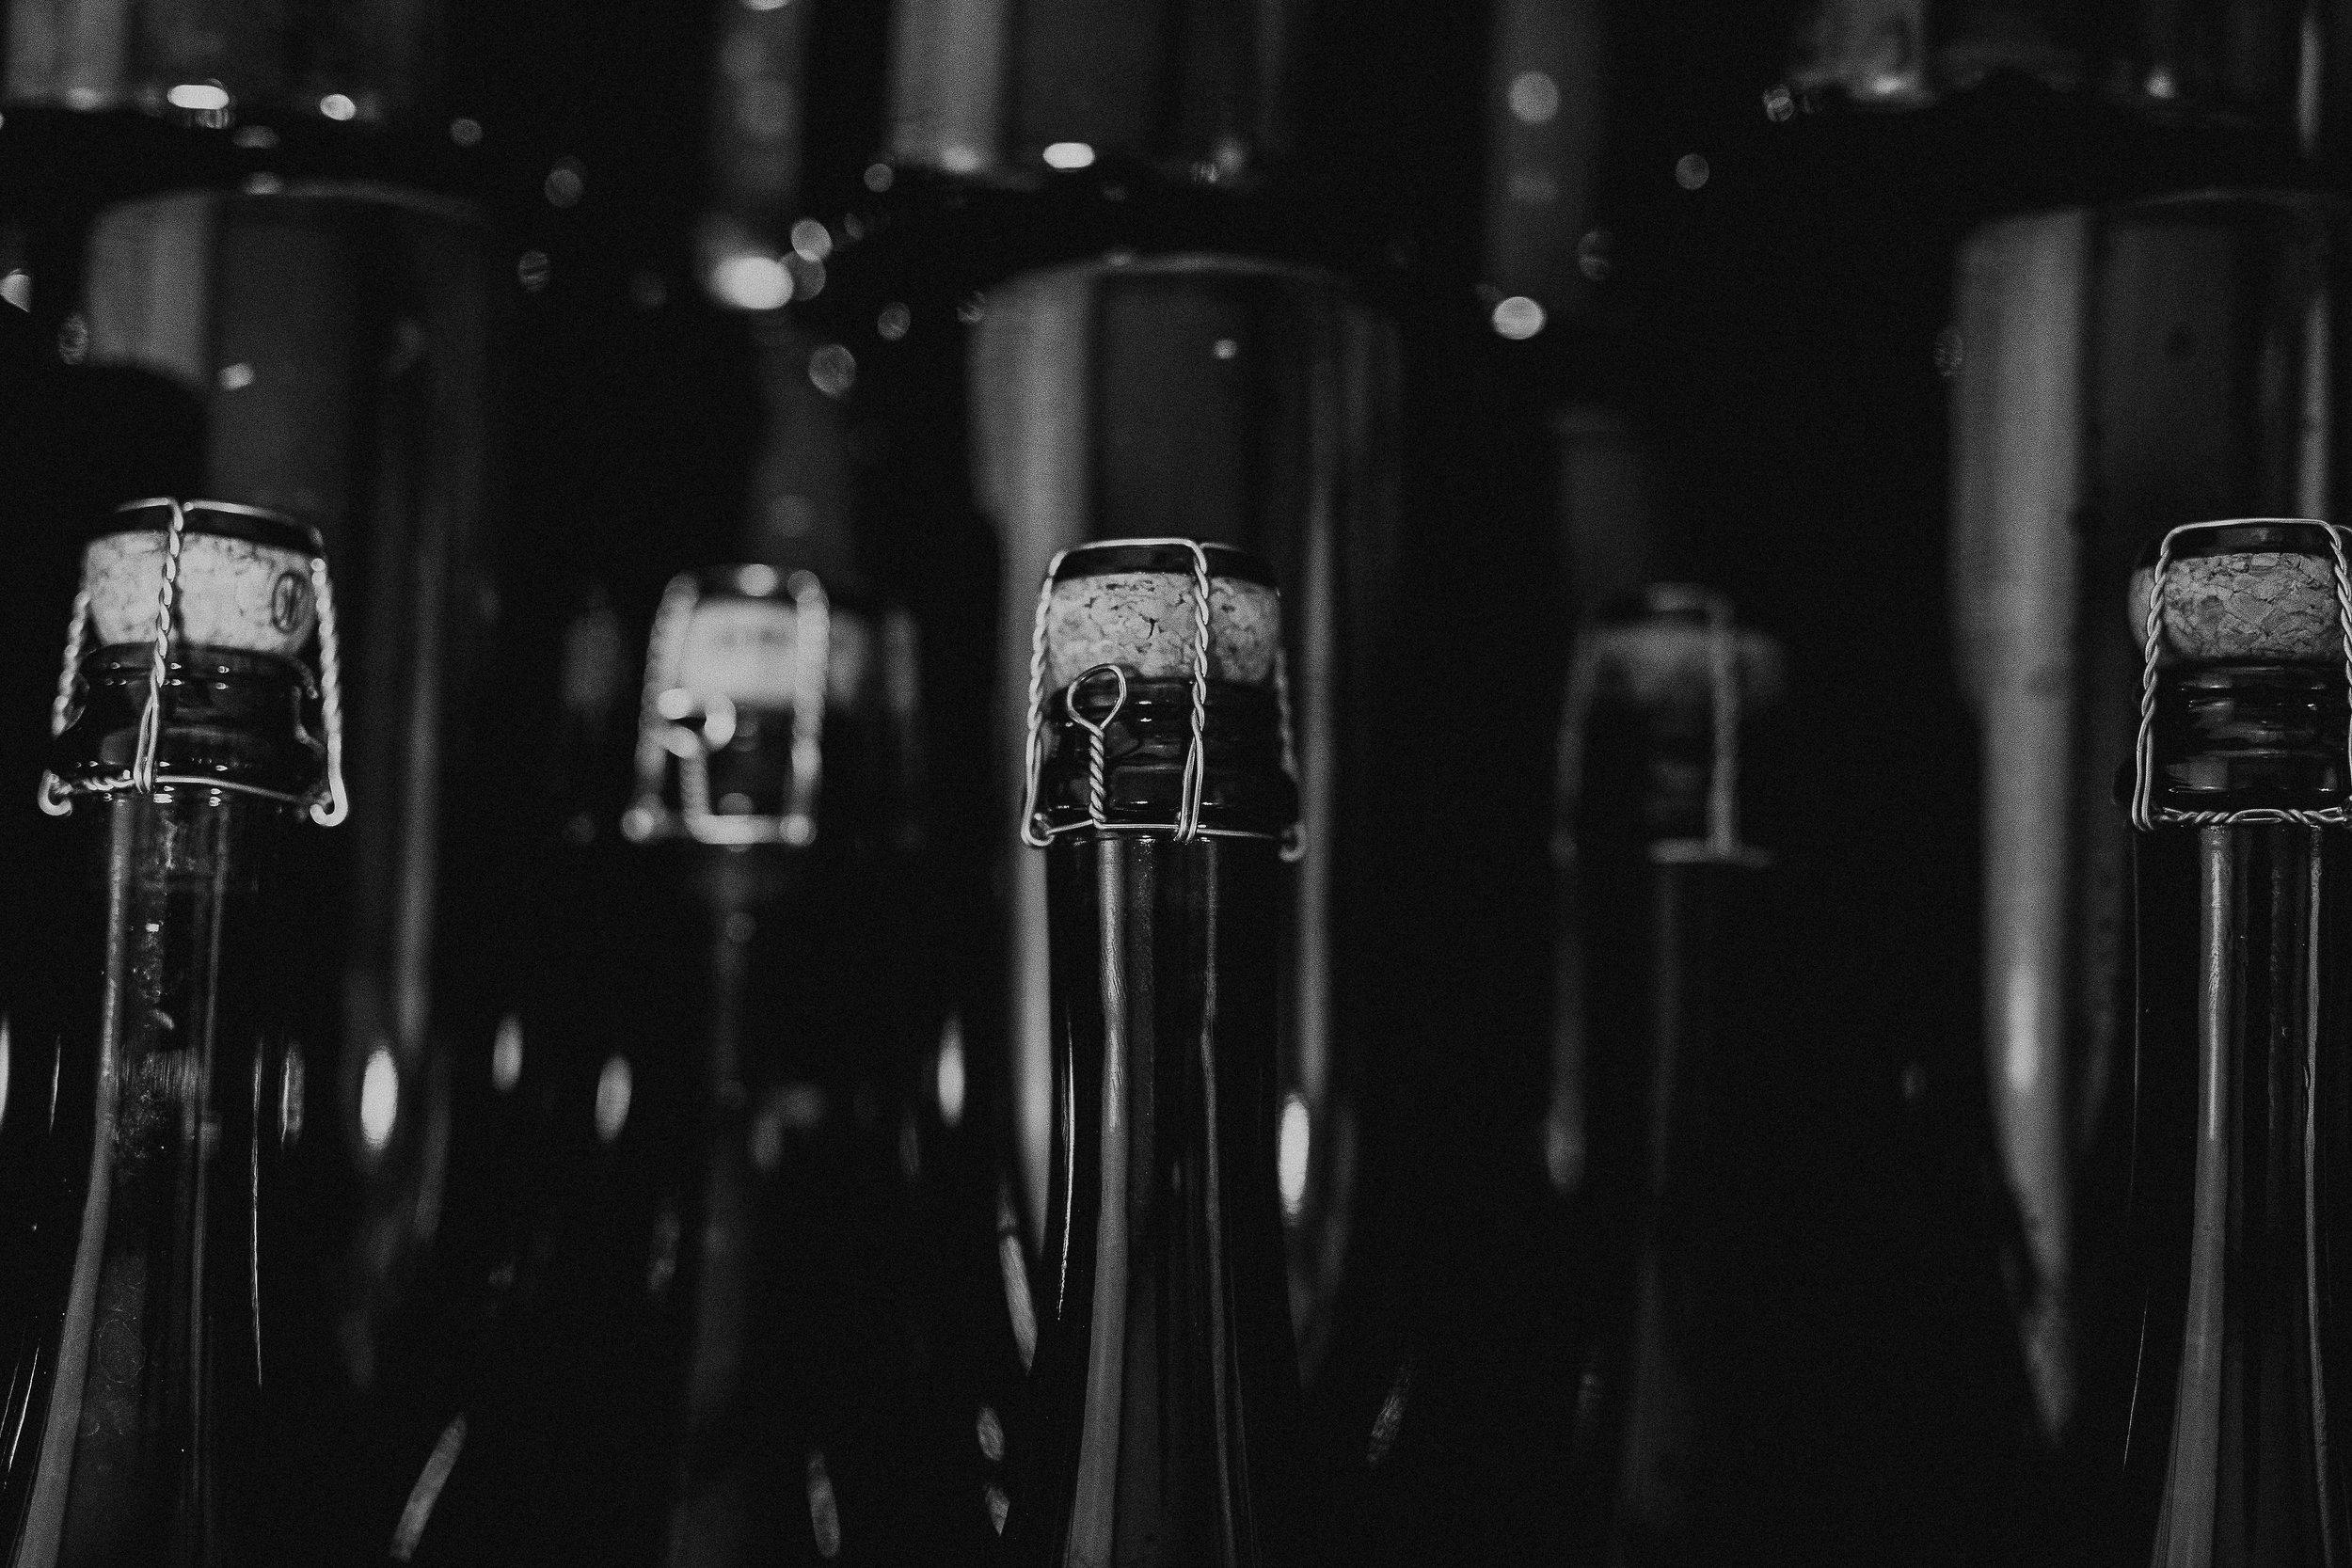 MJ Sparkling bottles